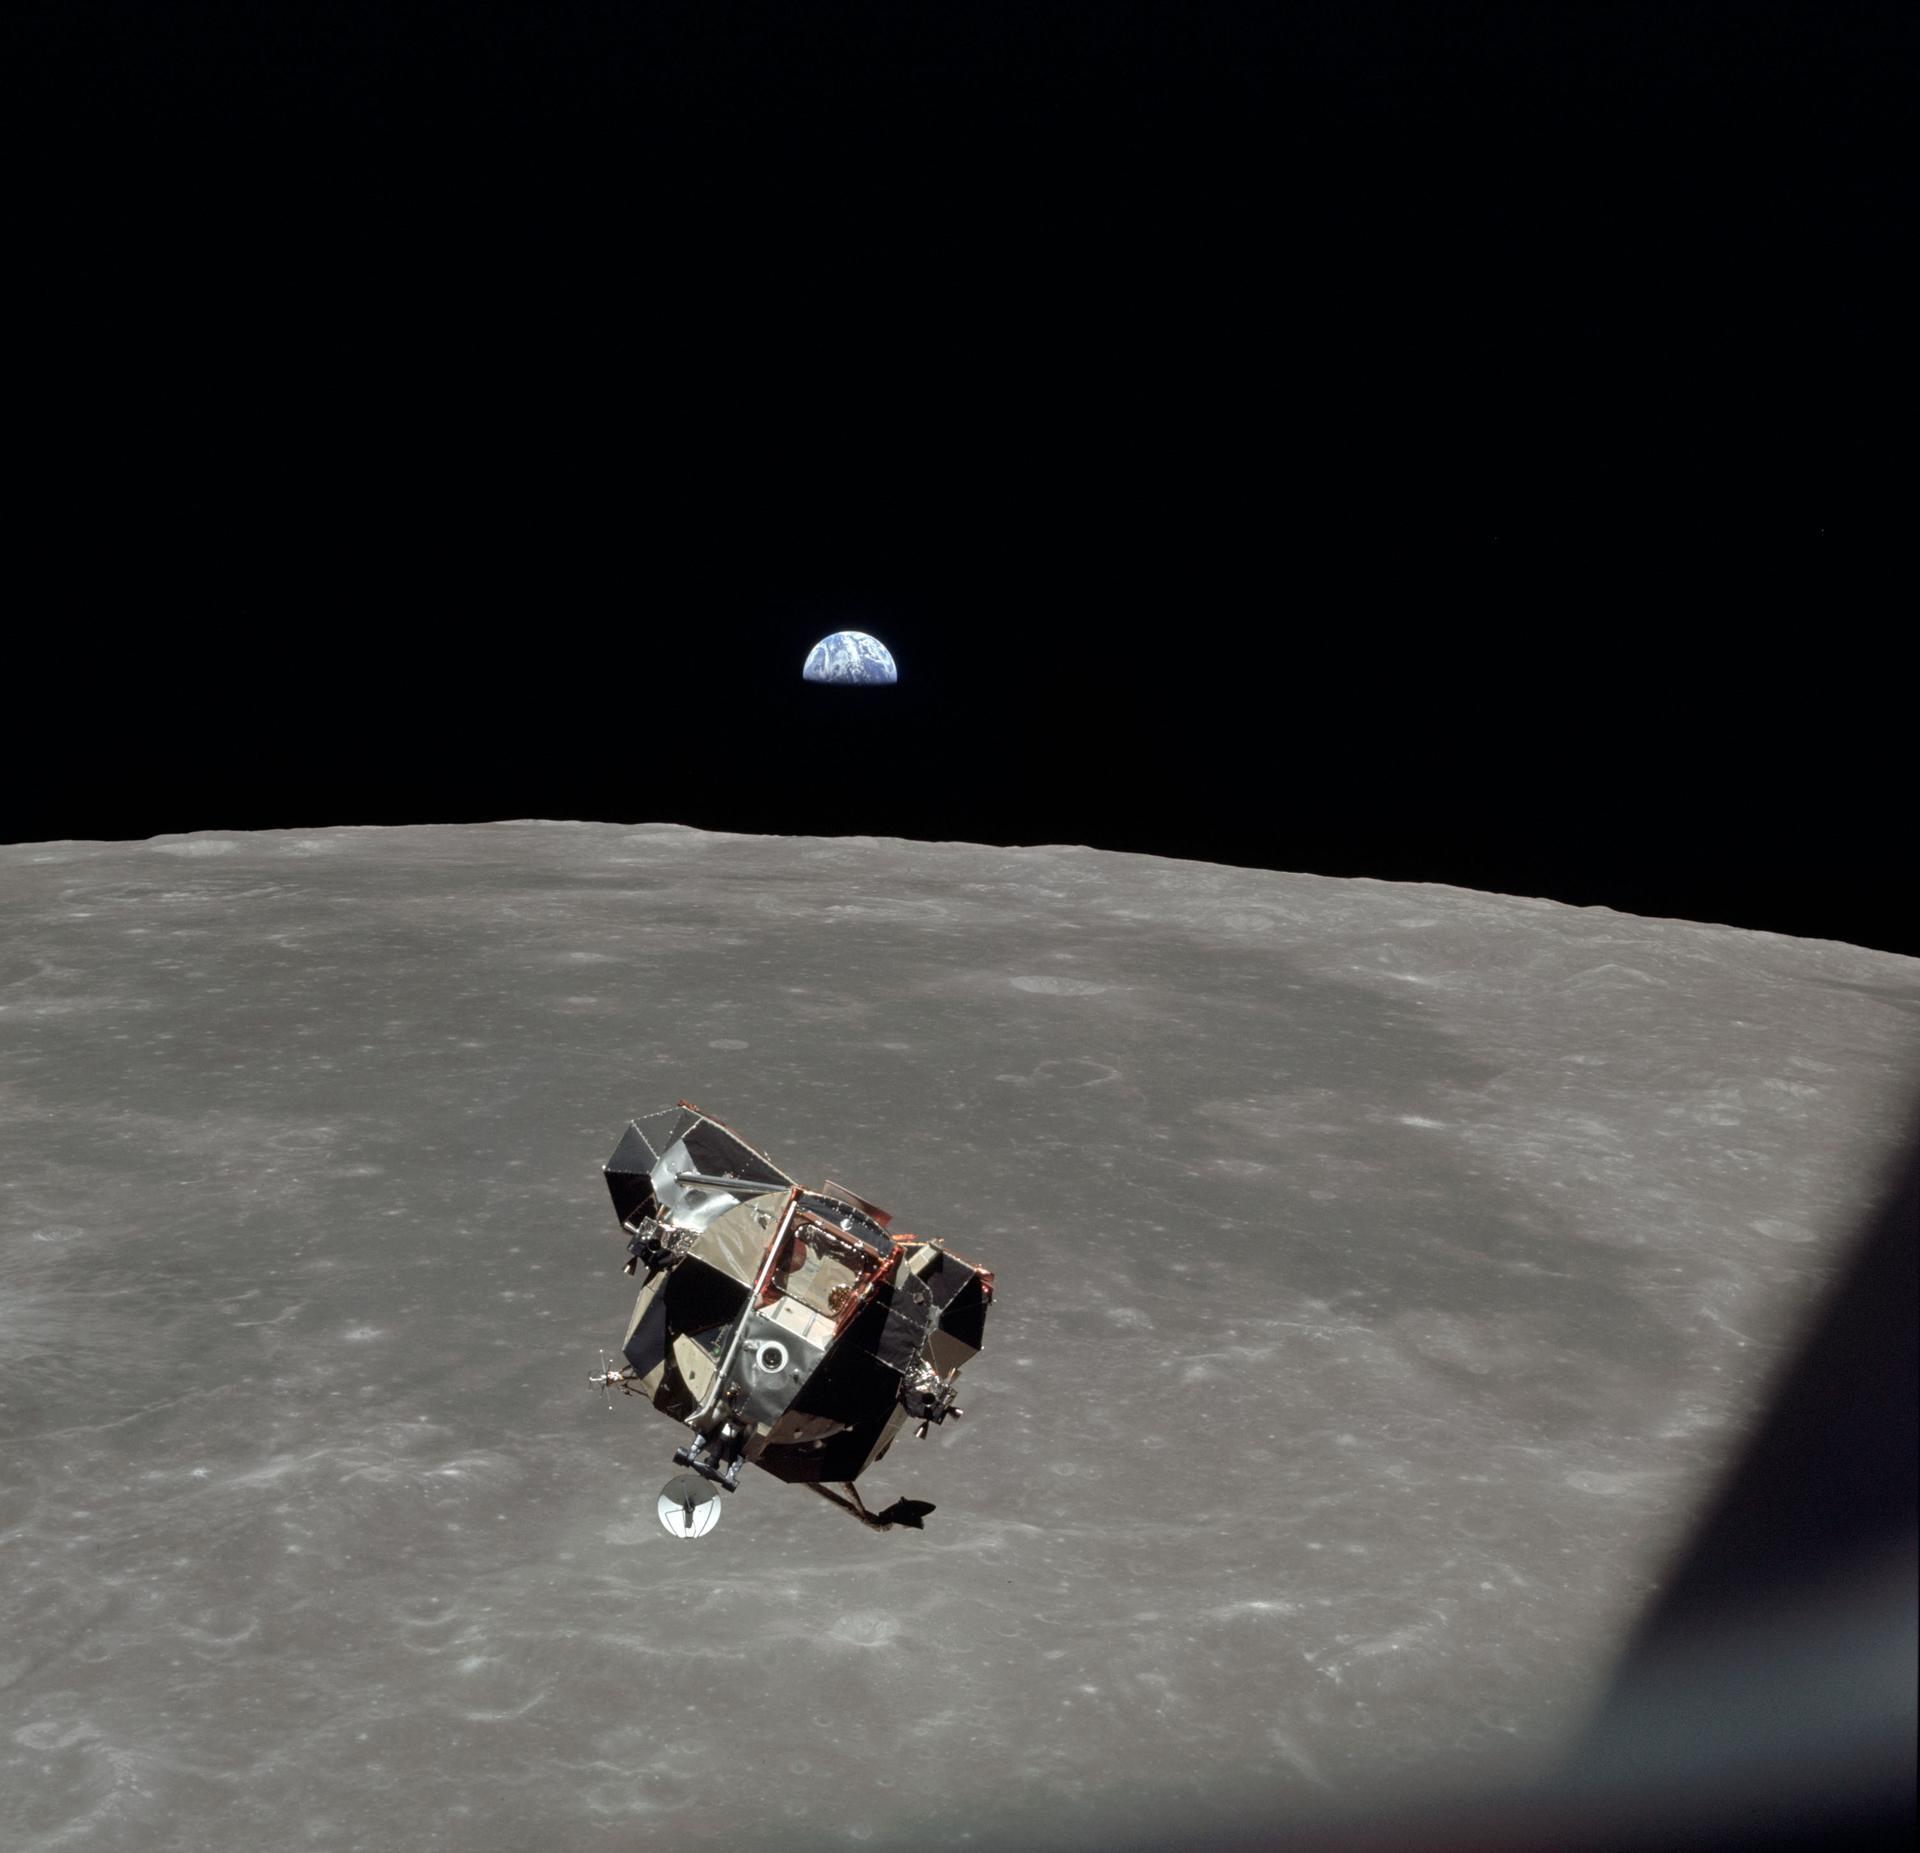 دقایقی پیش از پهلوگیری LM APM به CSM | مأموریت آپولو 11 | مدار ماه